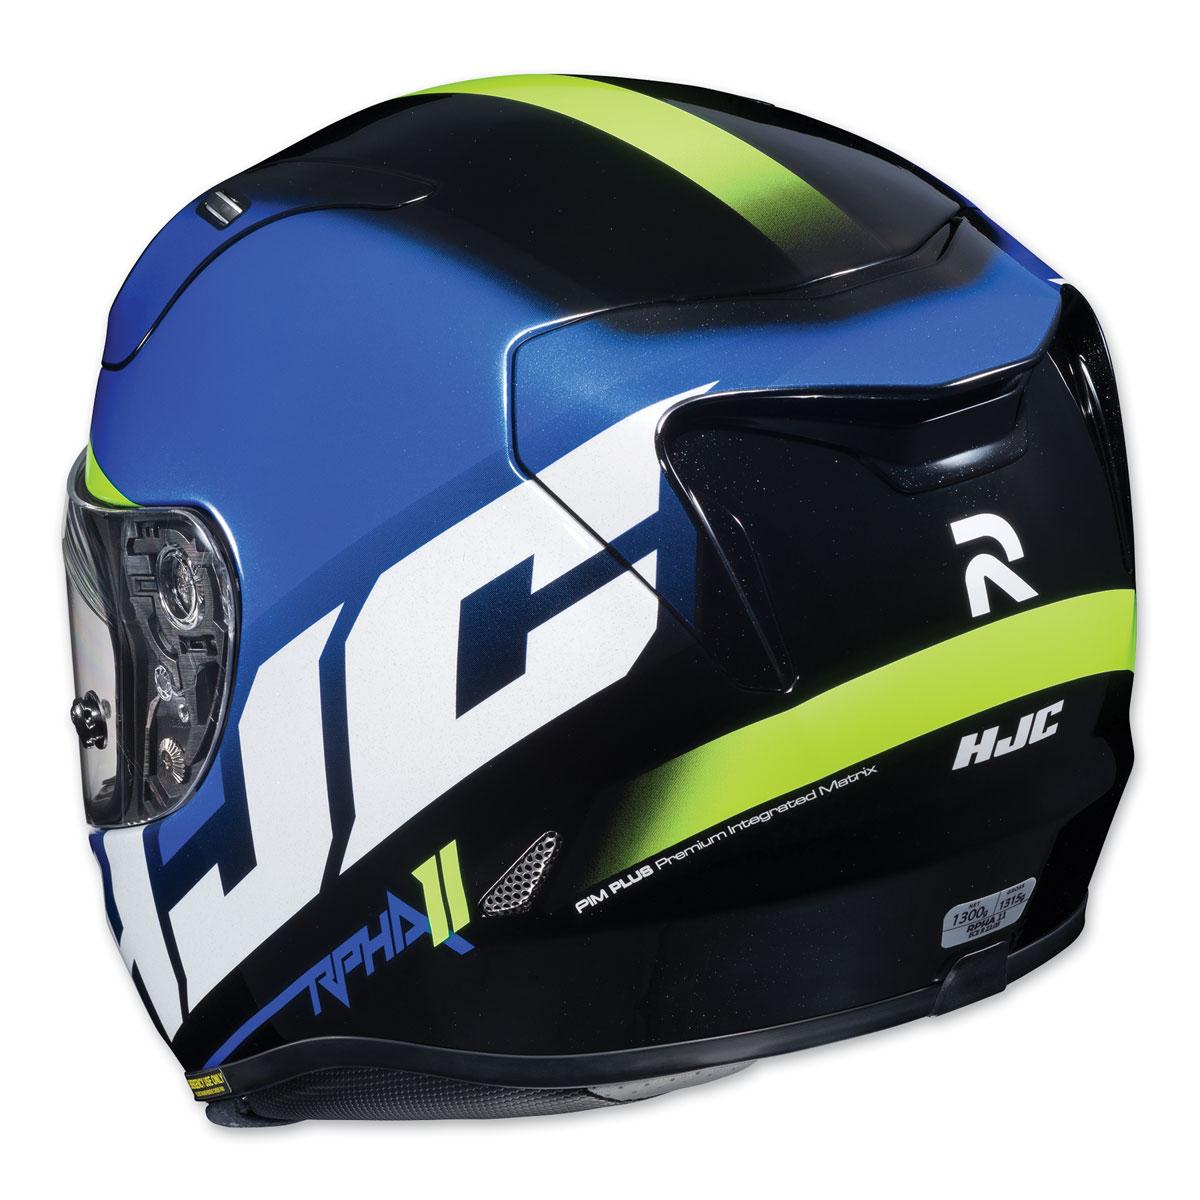 hjc rpha 11 pro spicho blue white full face helmet 160 1725 j p cycles. Black Bedroom Furniture Sets. Home Design Ideas